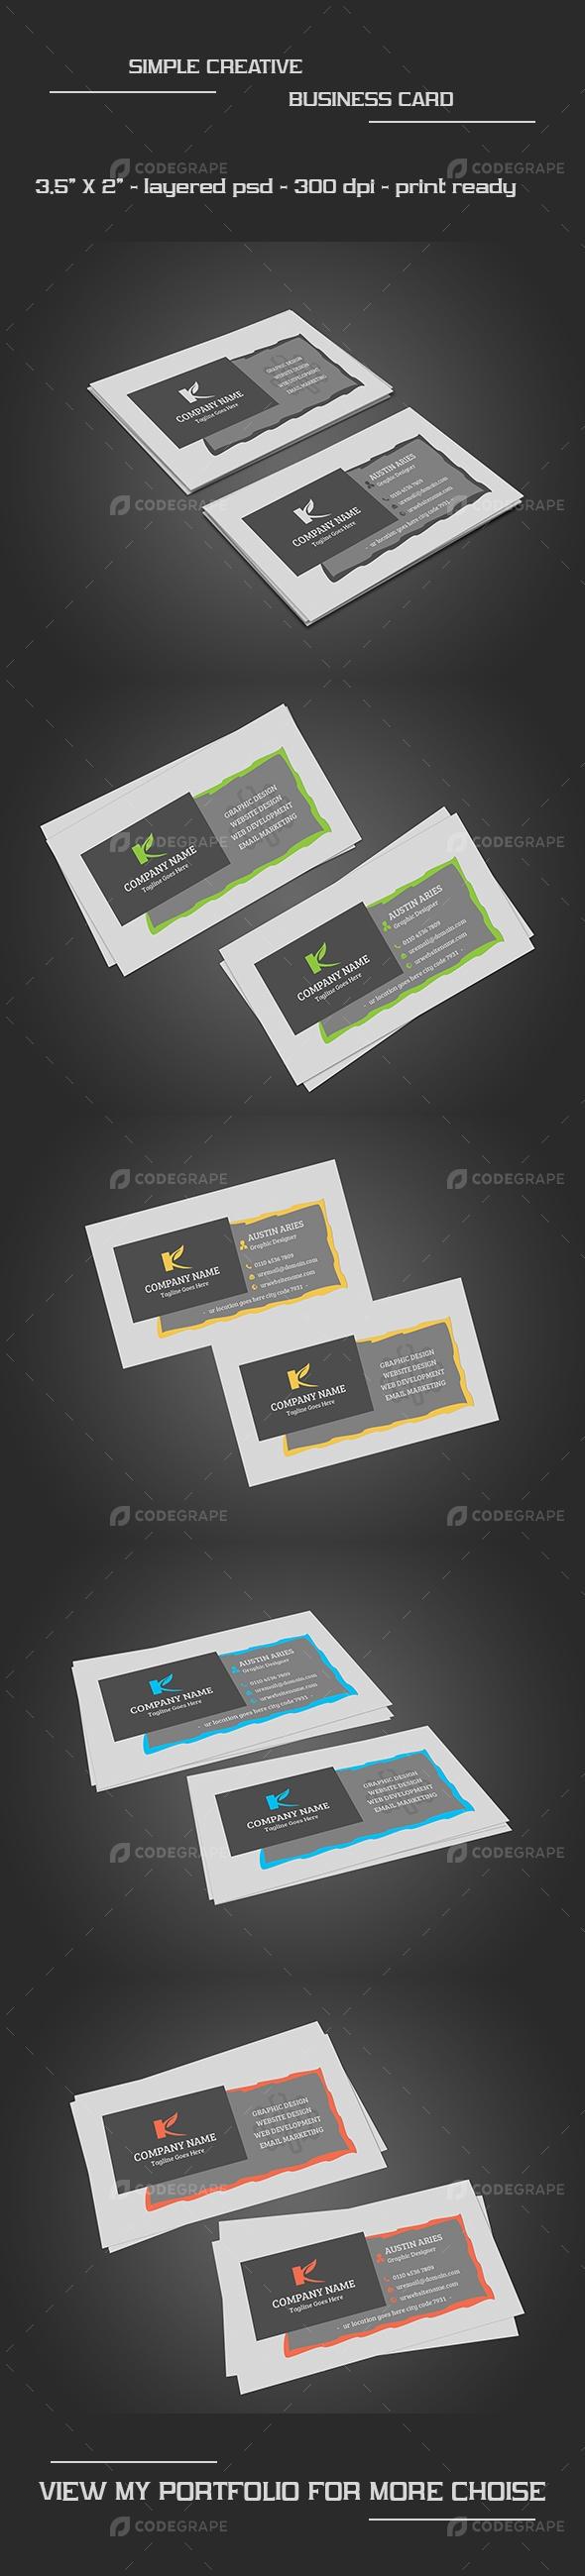 Simple Creative Business Card